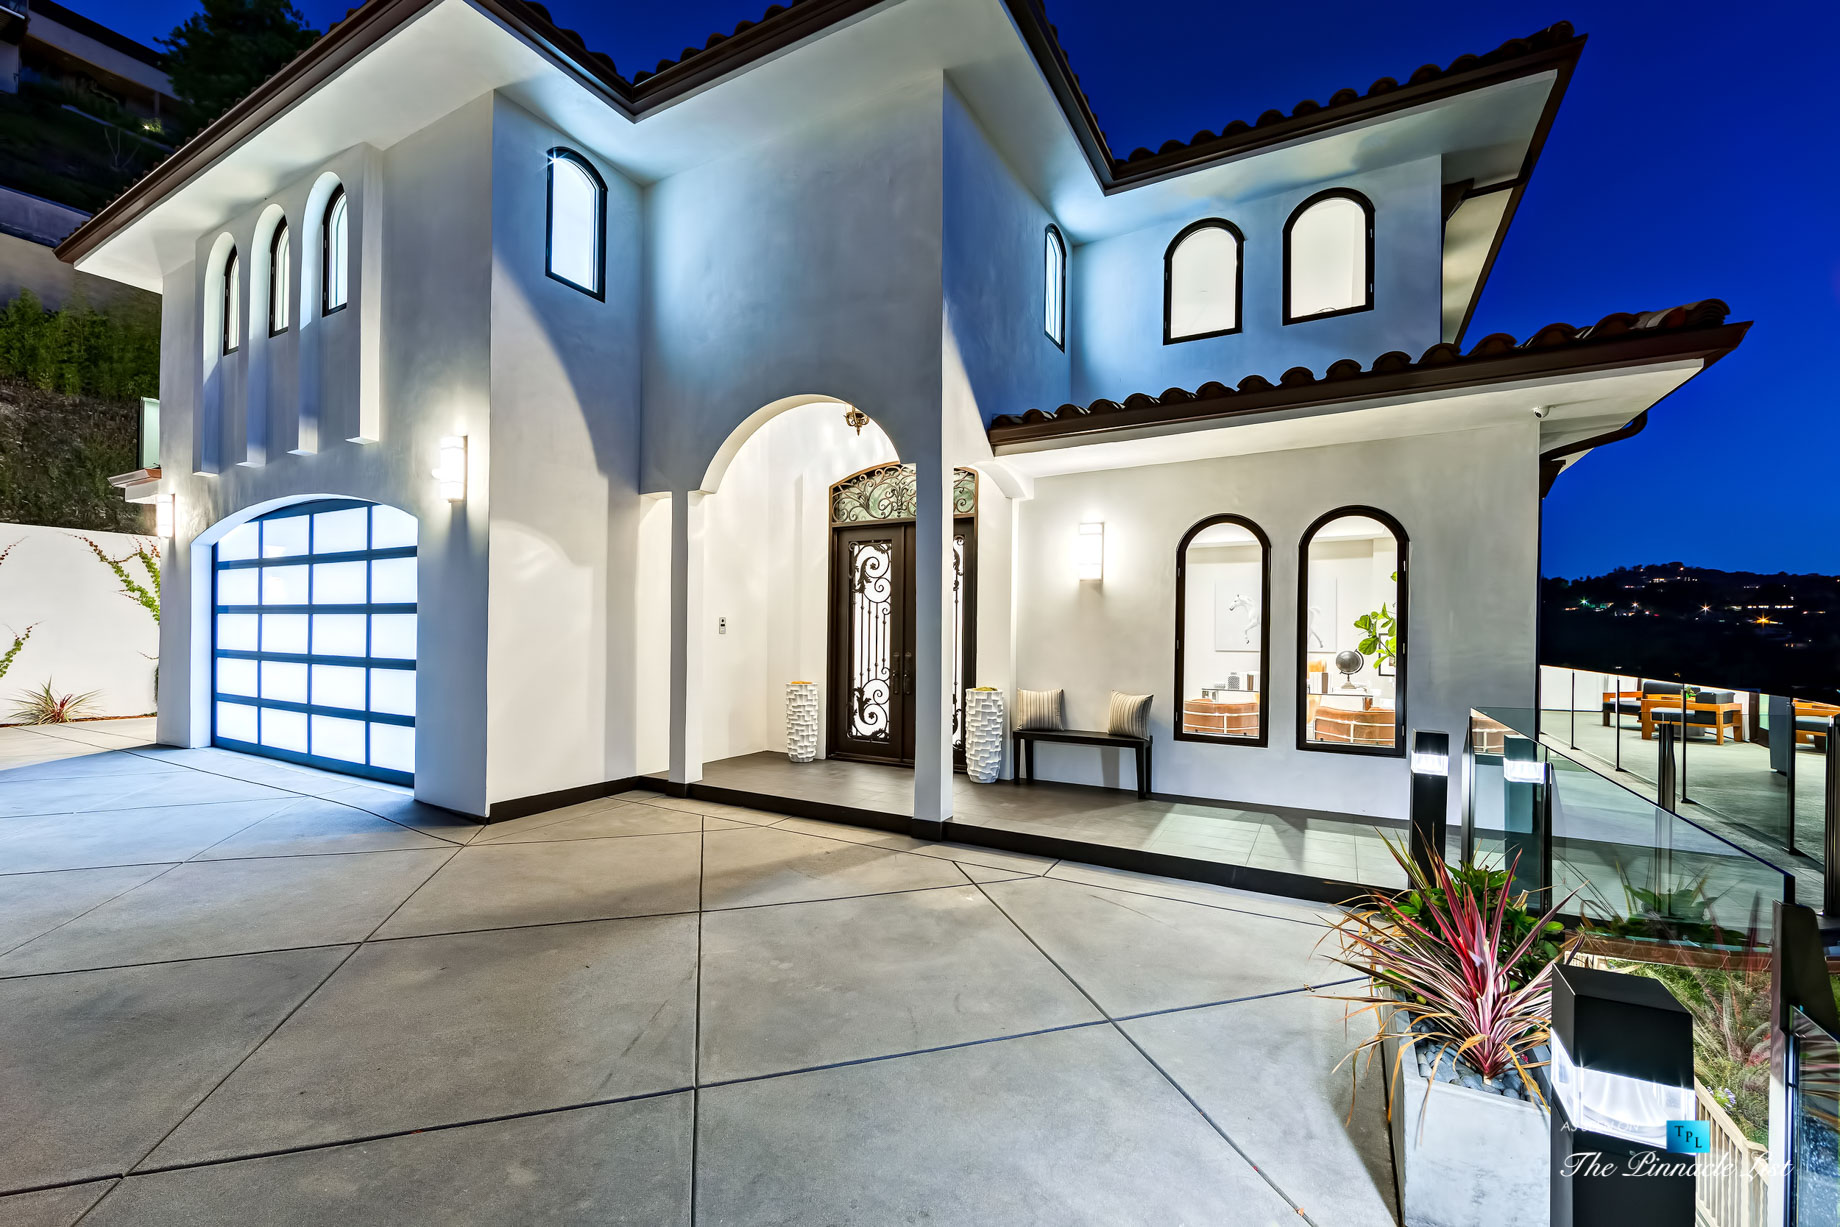 082 – 15234 Rayneta Drive, Sherman Oaks, CA, USA